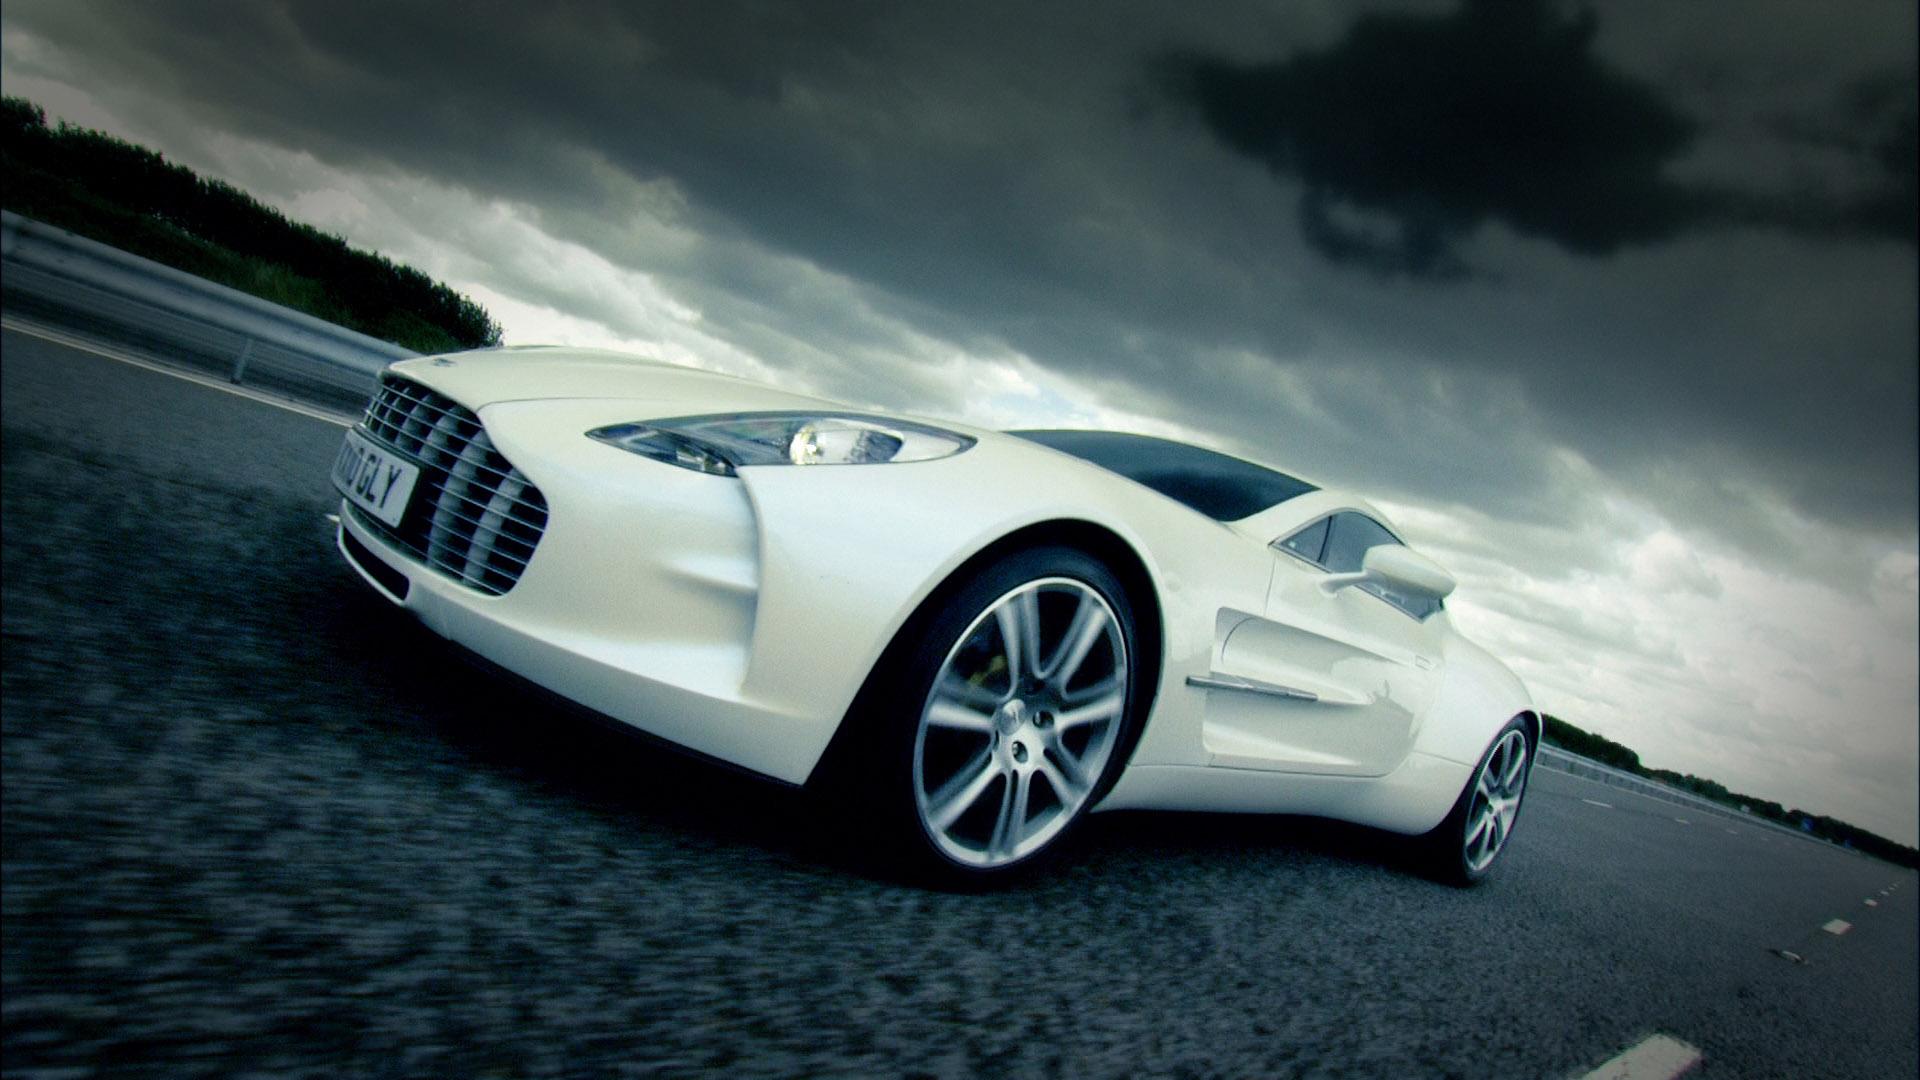 Aston Martin One 77 Picture 42513